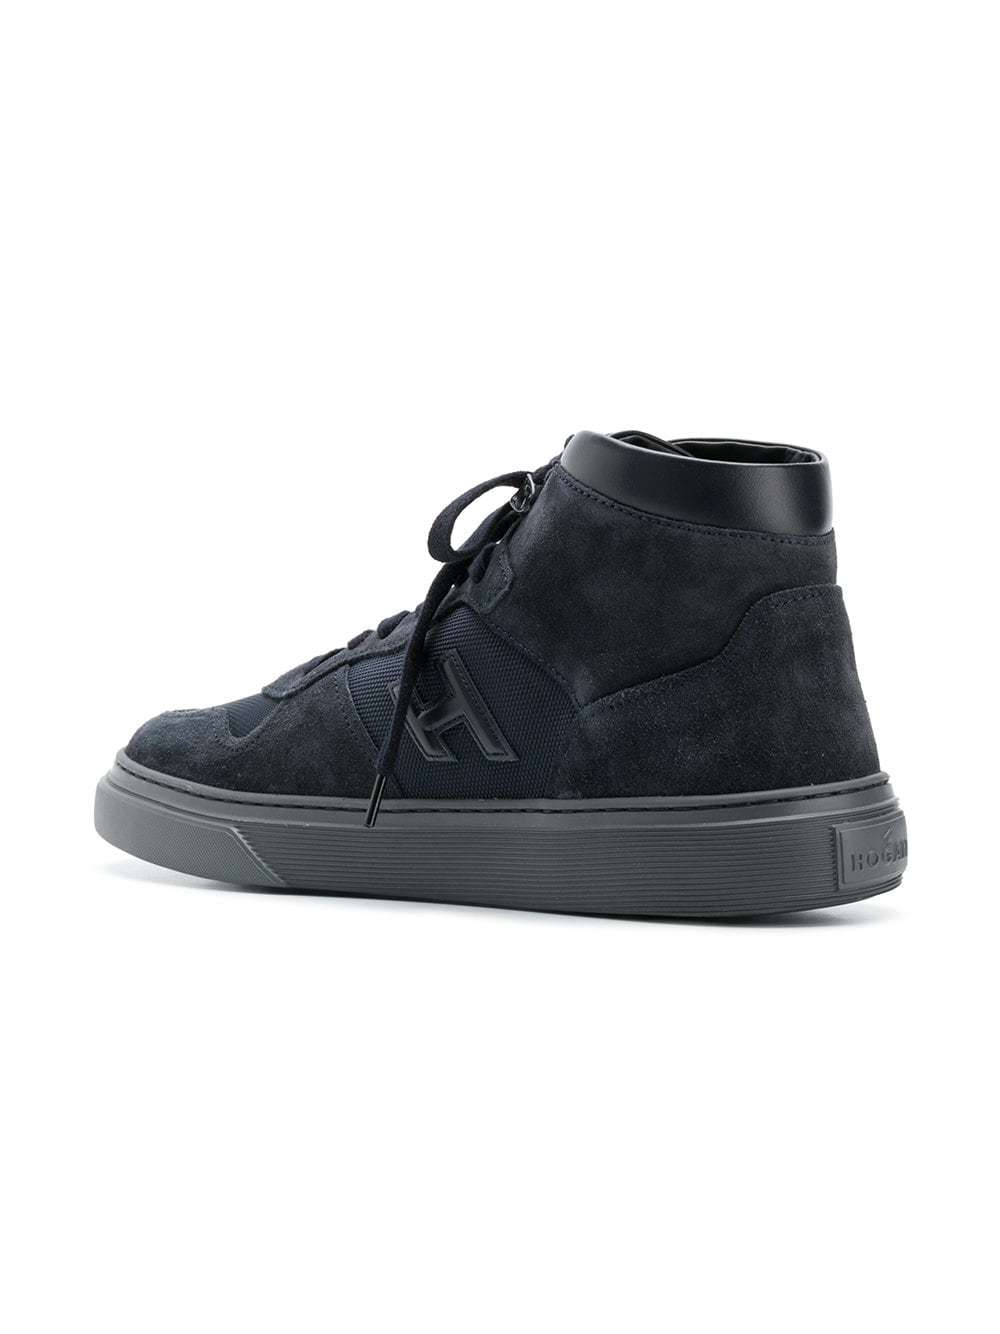 recognized brands buy popular factory price Hogan High Top Sneakers, £279 | farfetch.com | Lookastic UK